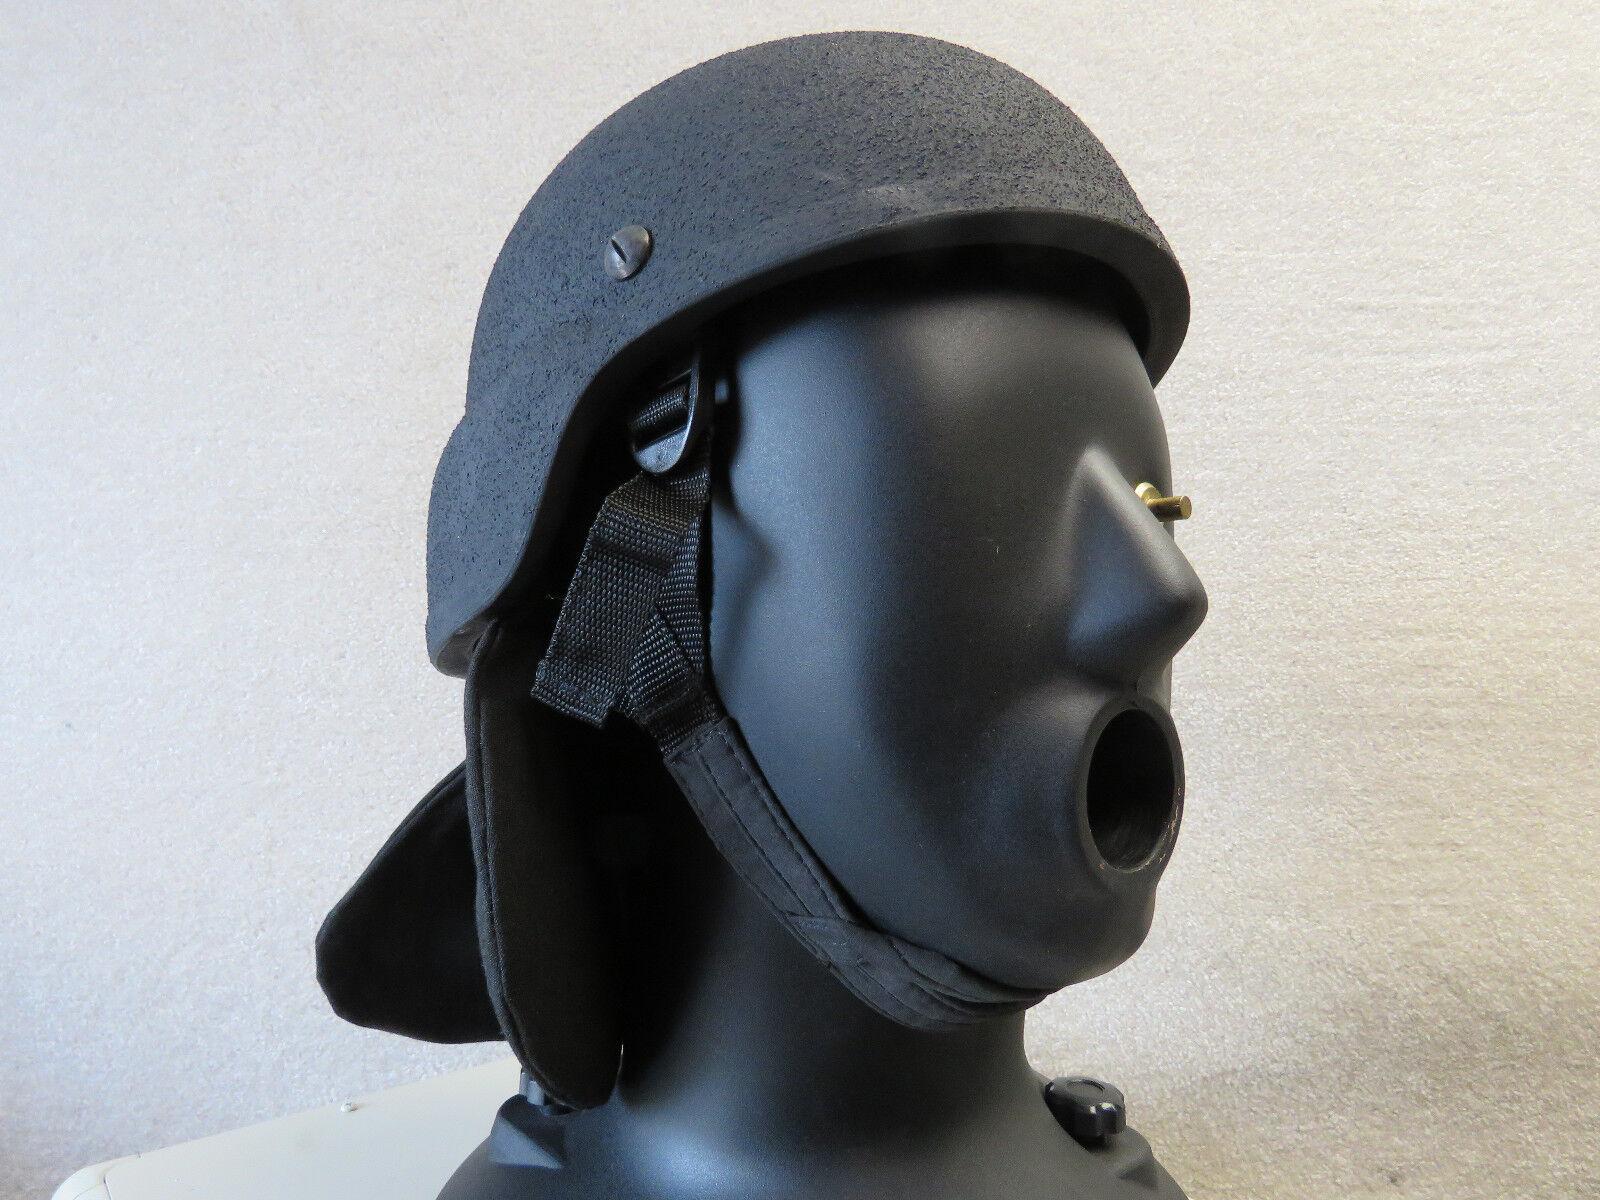 ProTech Tactical Delta 4 Armored  Ballistic Helmet Level IIIA - MEDIUM QTY AVAIL  online discount